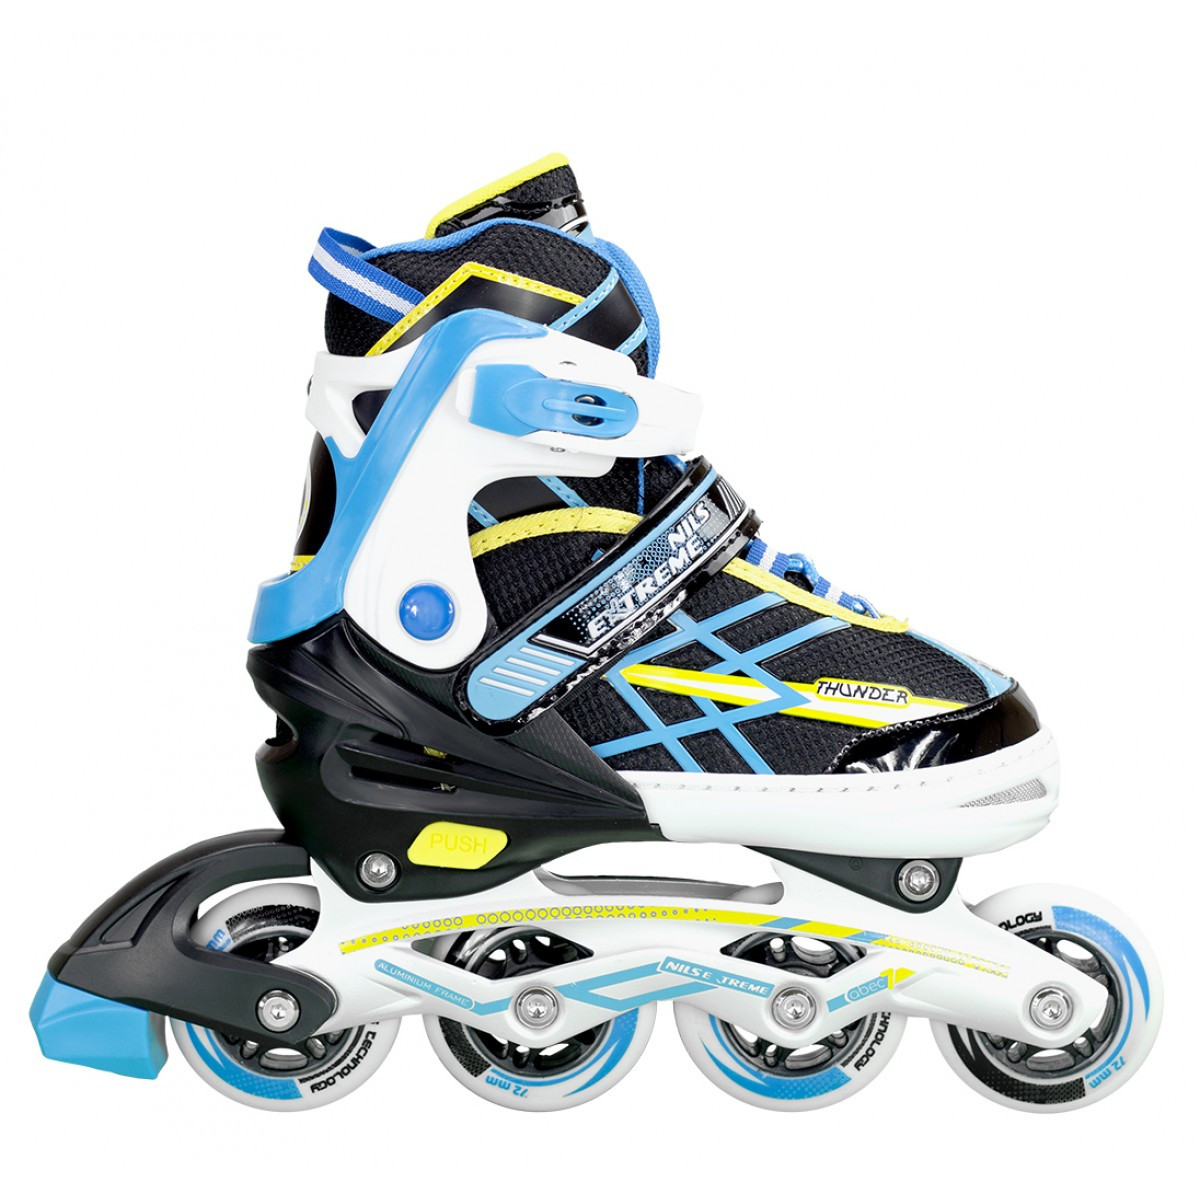 Роликовые коньки Nils Extreme NA1160A Size 31-34 Black/Blue